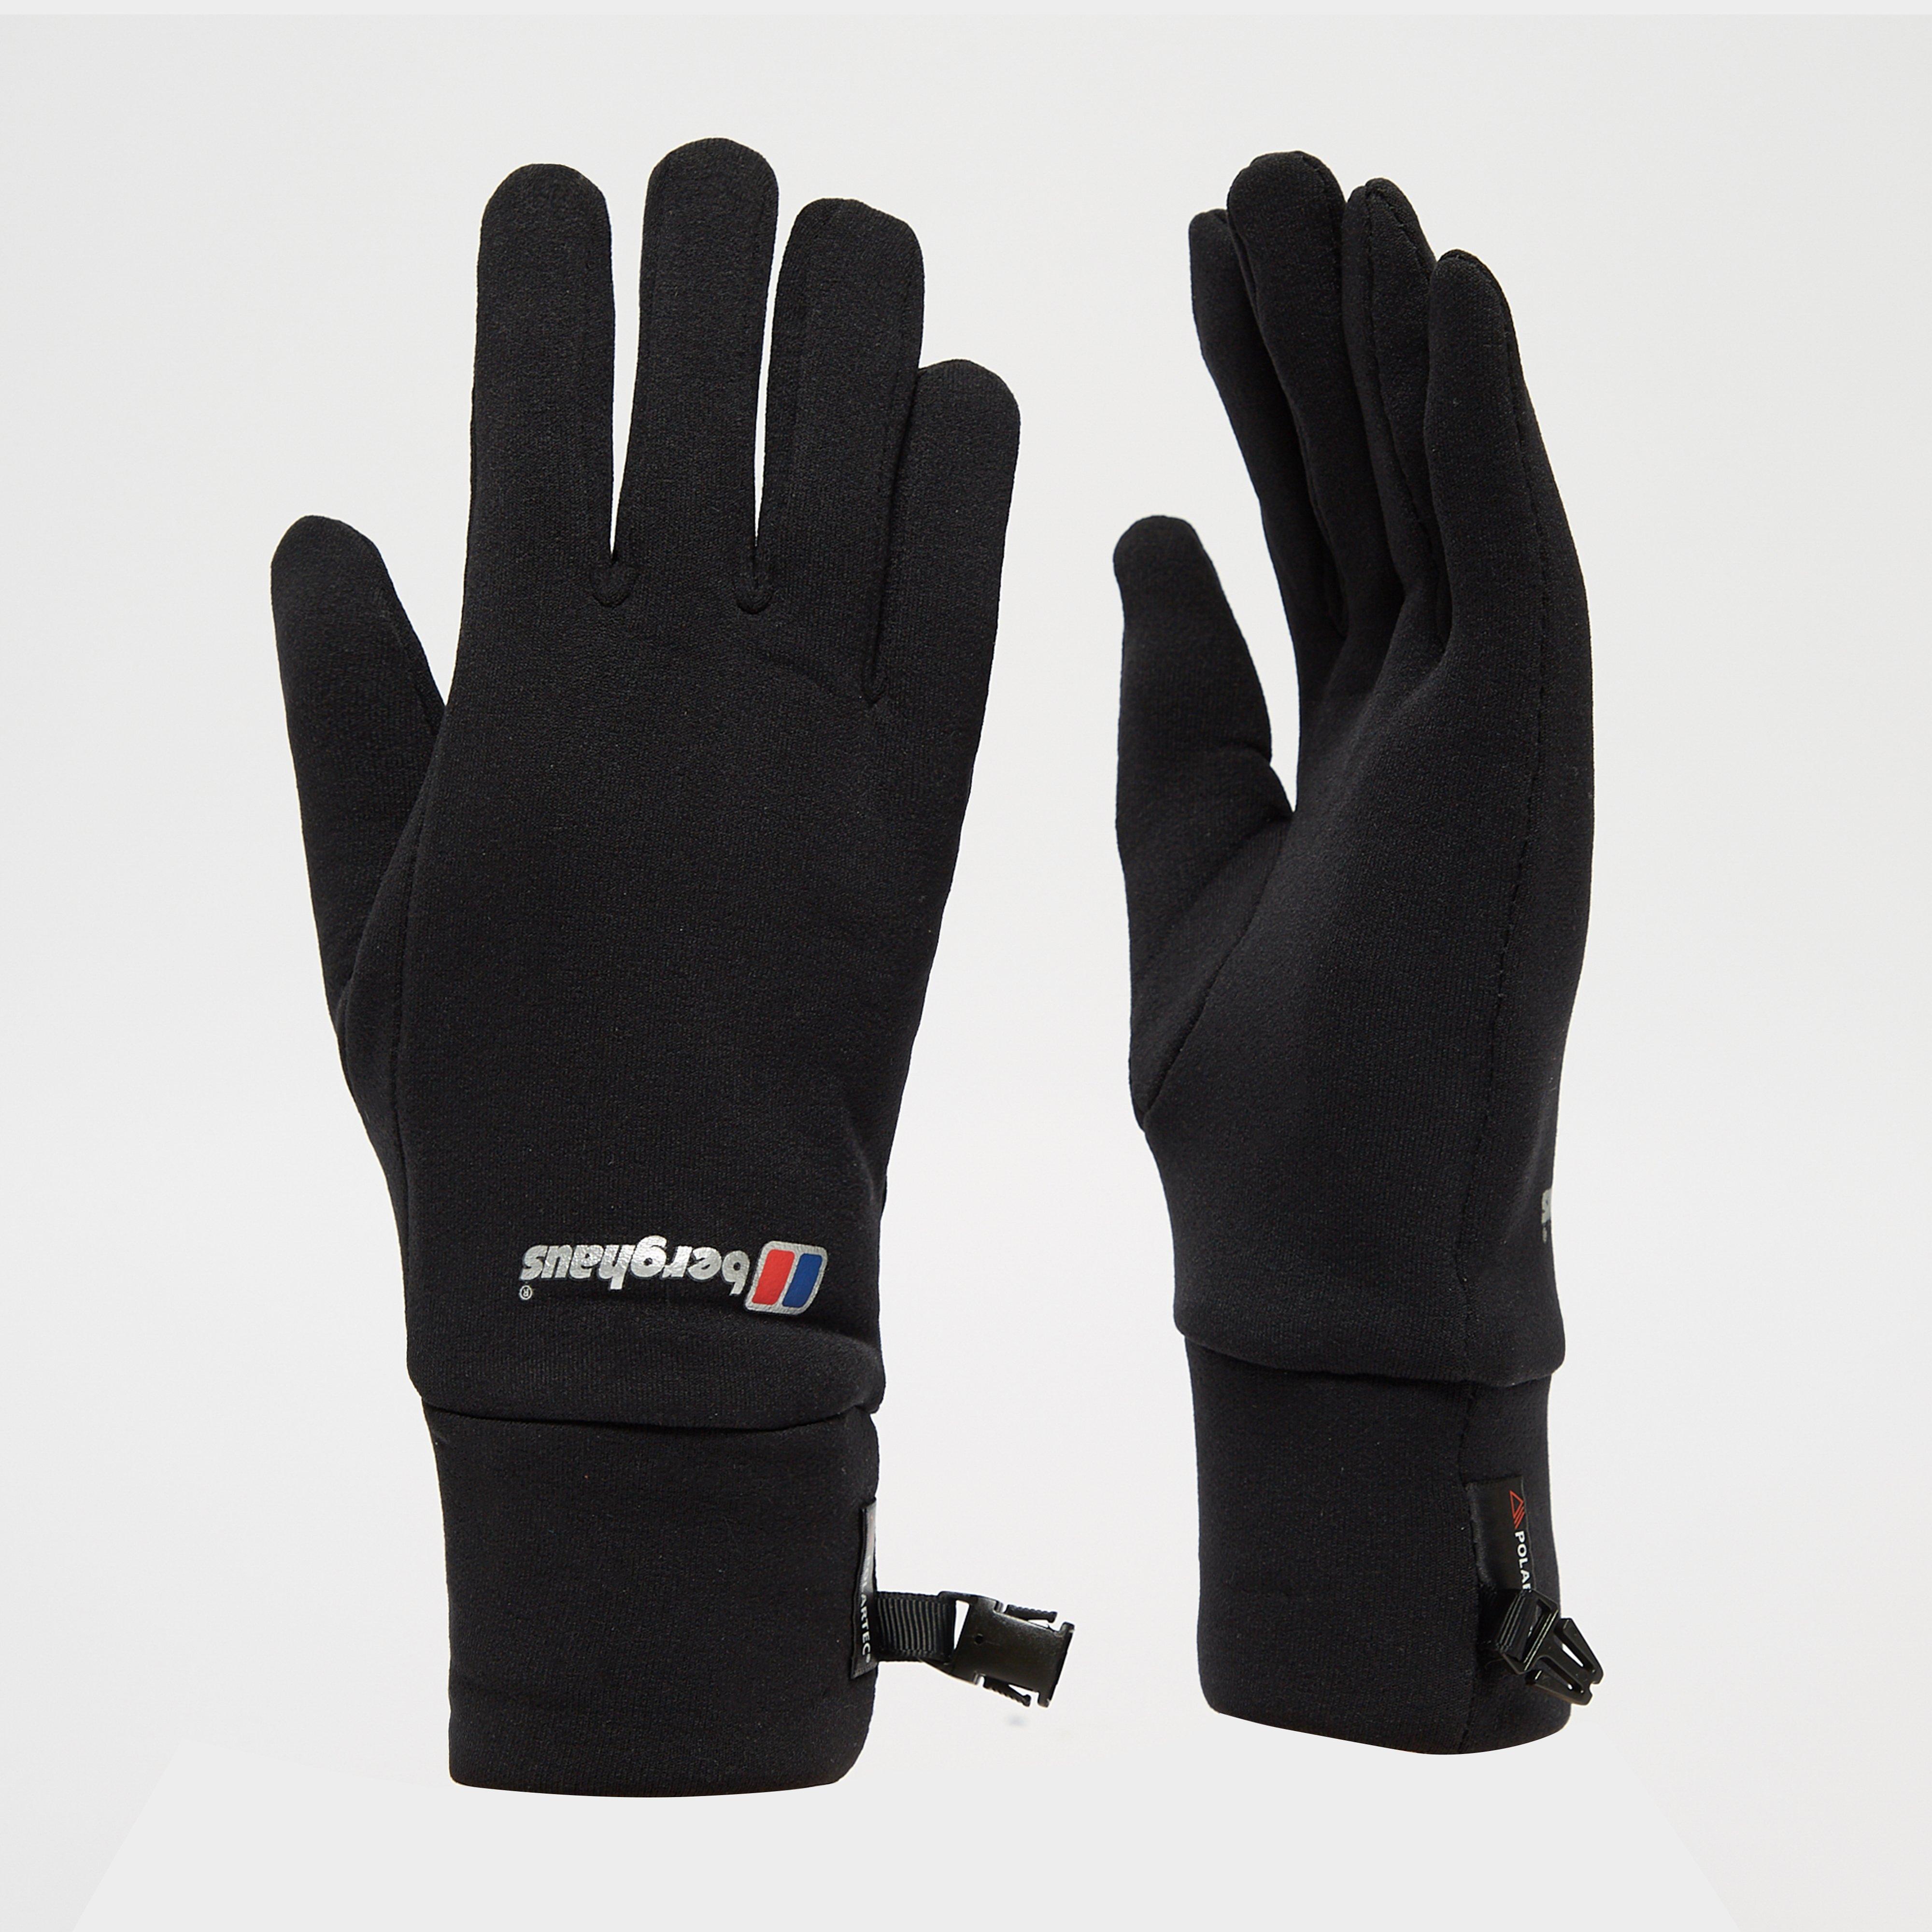 Berghaus Power Stretch Gloves - Black, Black